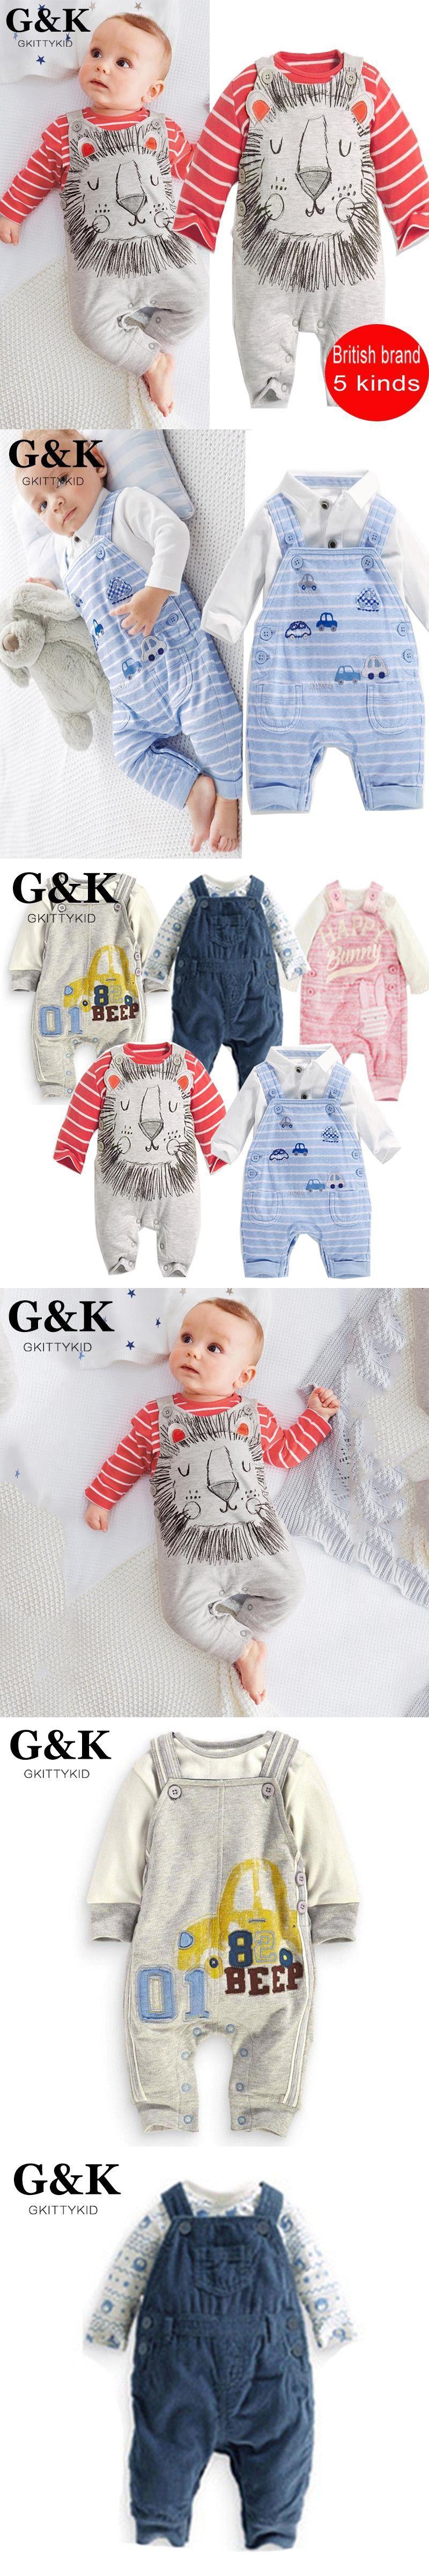 Summer style Baby clothing set new British brand baby girl boy